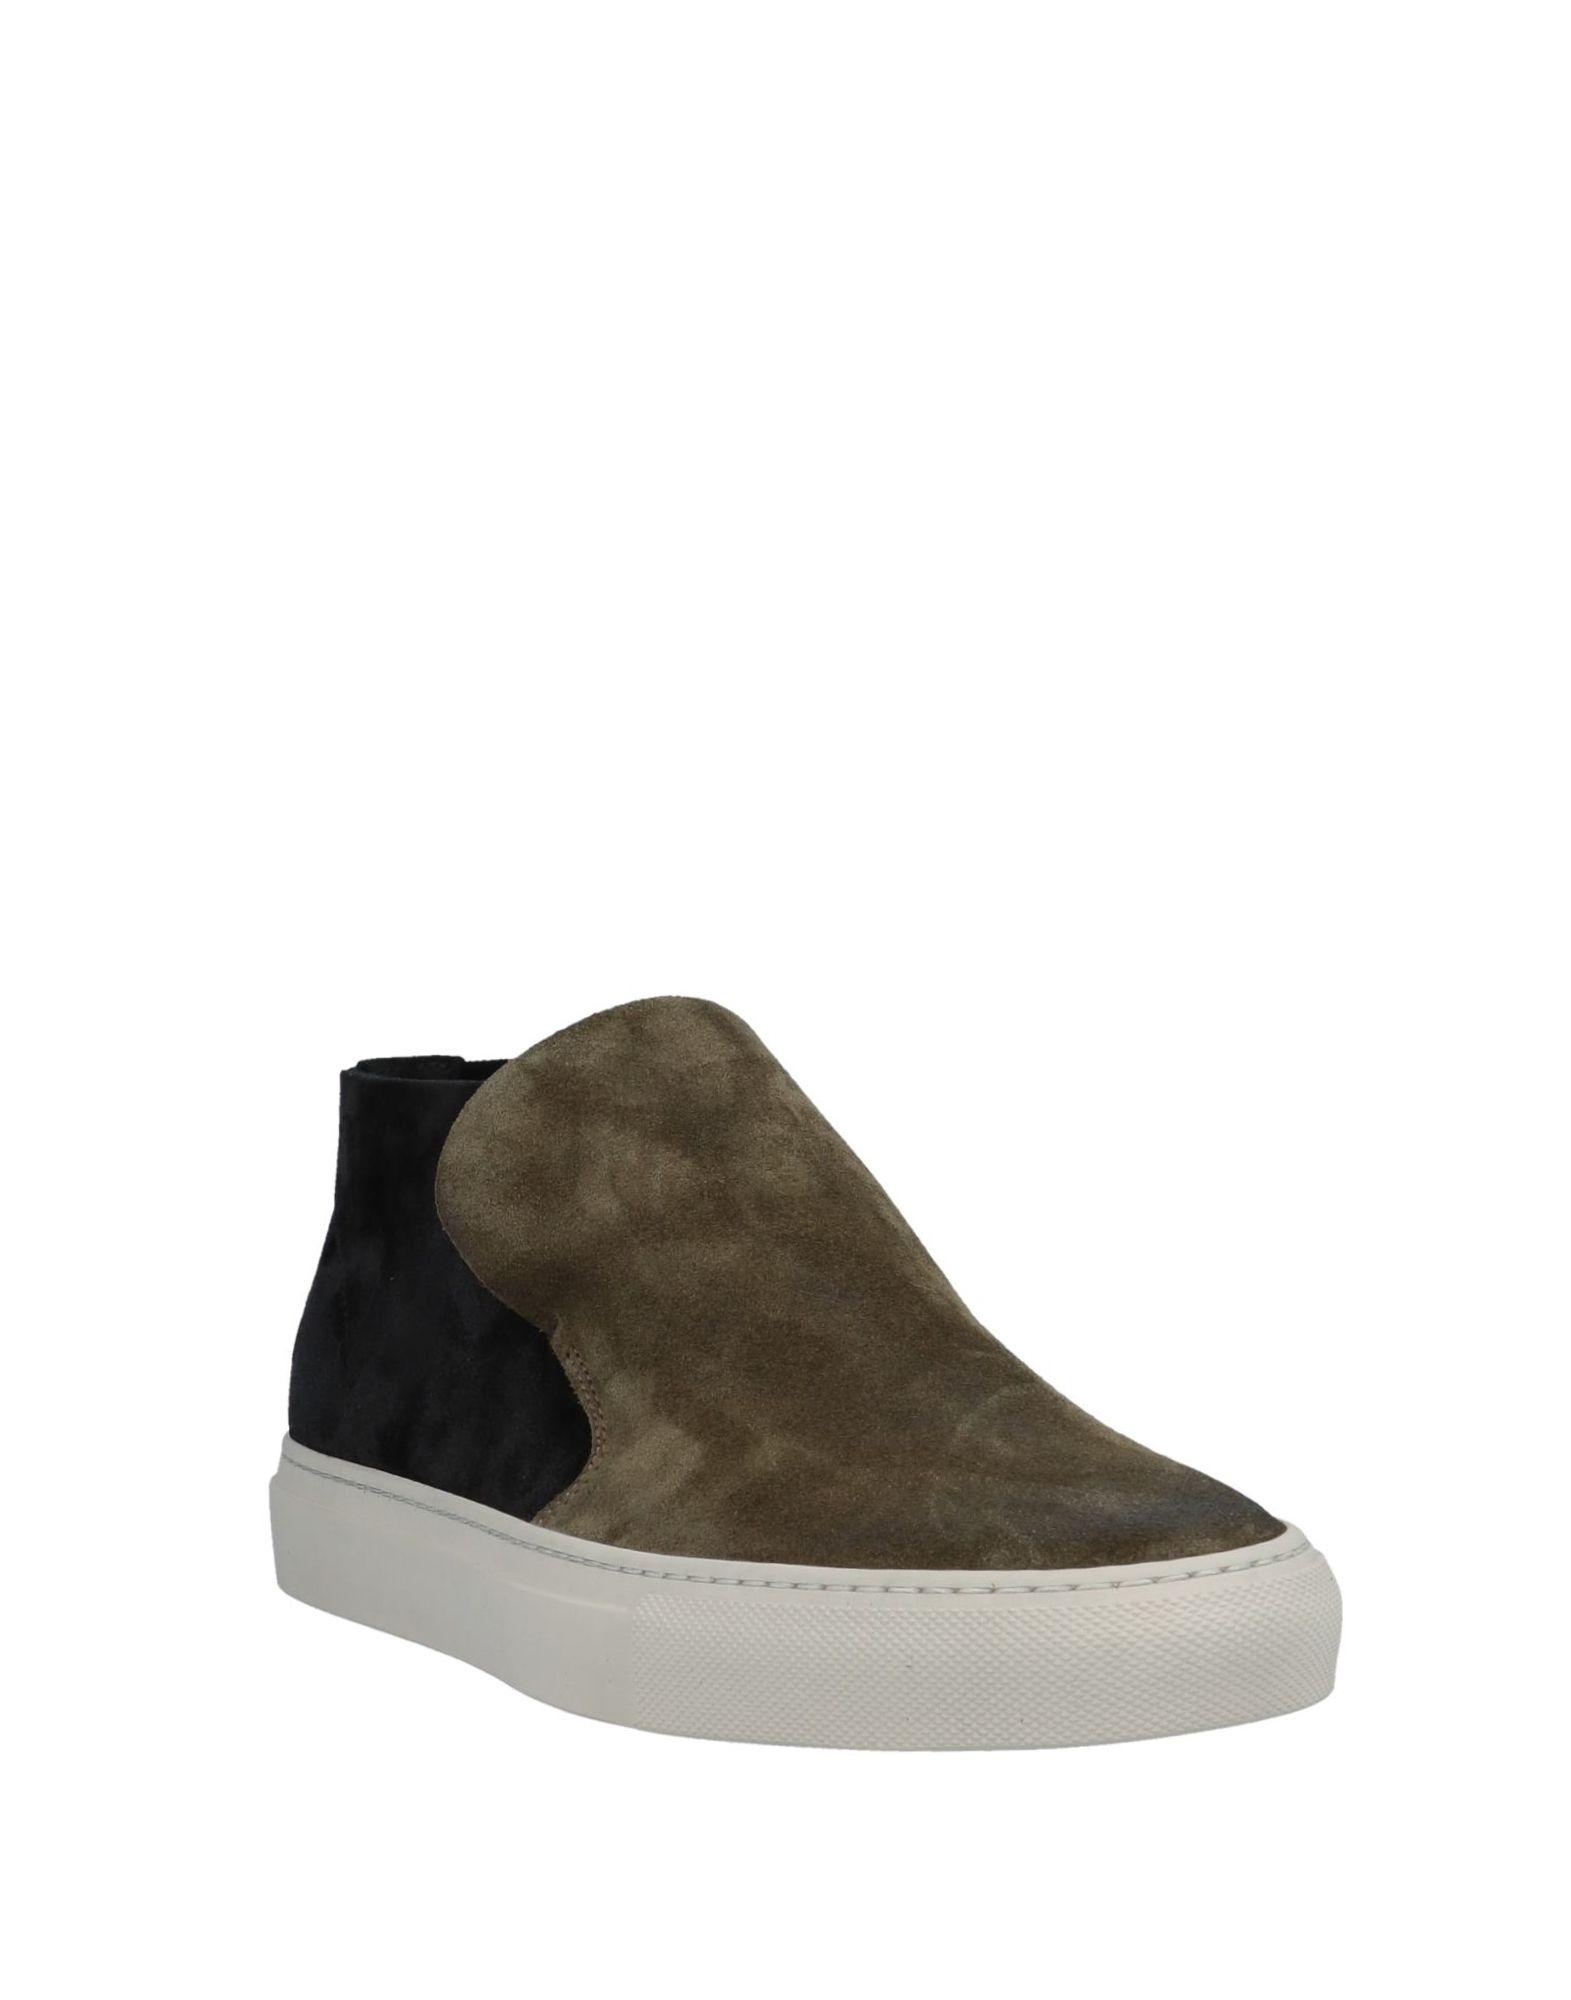 Buttero® Sneakers Herren  11552631VN Gute Qualität beliebte Schuhe